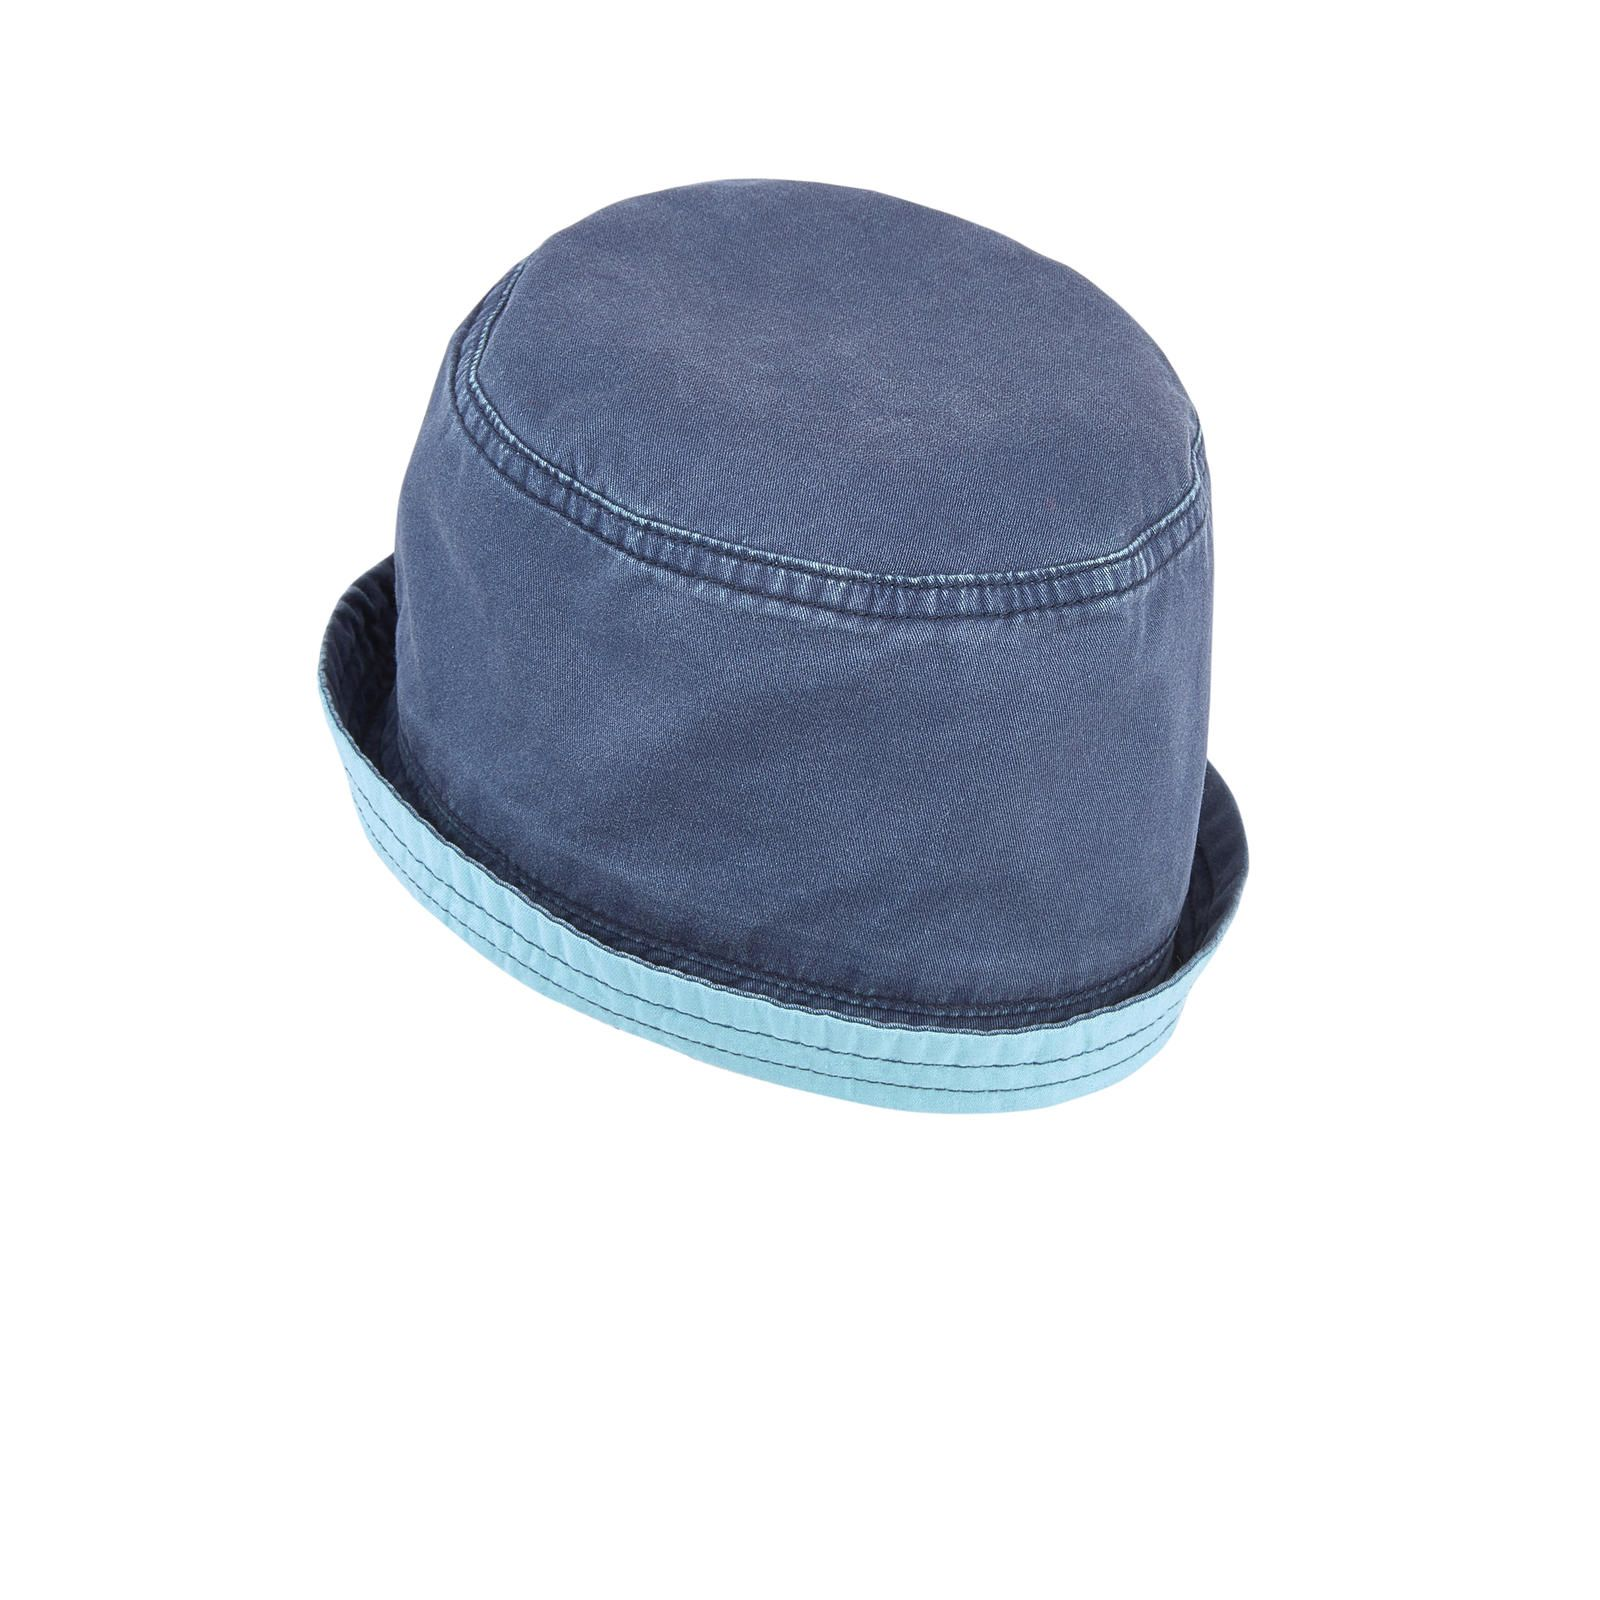 5c33831d Men Women Plus Size Retro Brimless Hat Adjustable Hats For Big Head Rolled  Cuff Sailor Cap